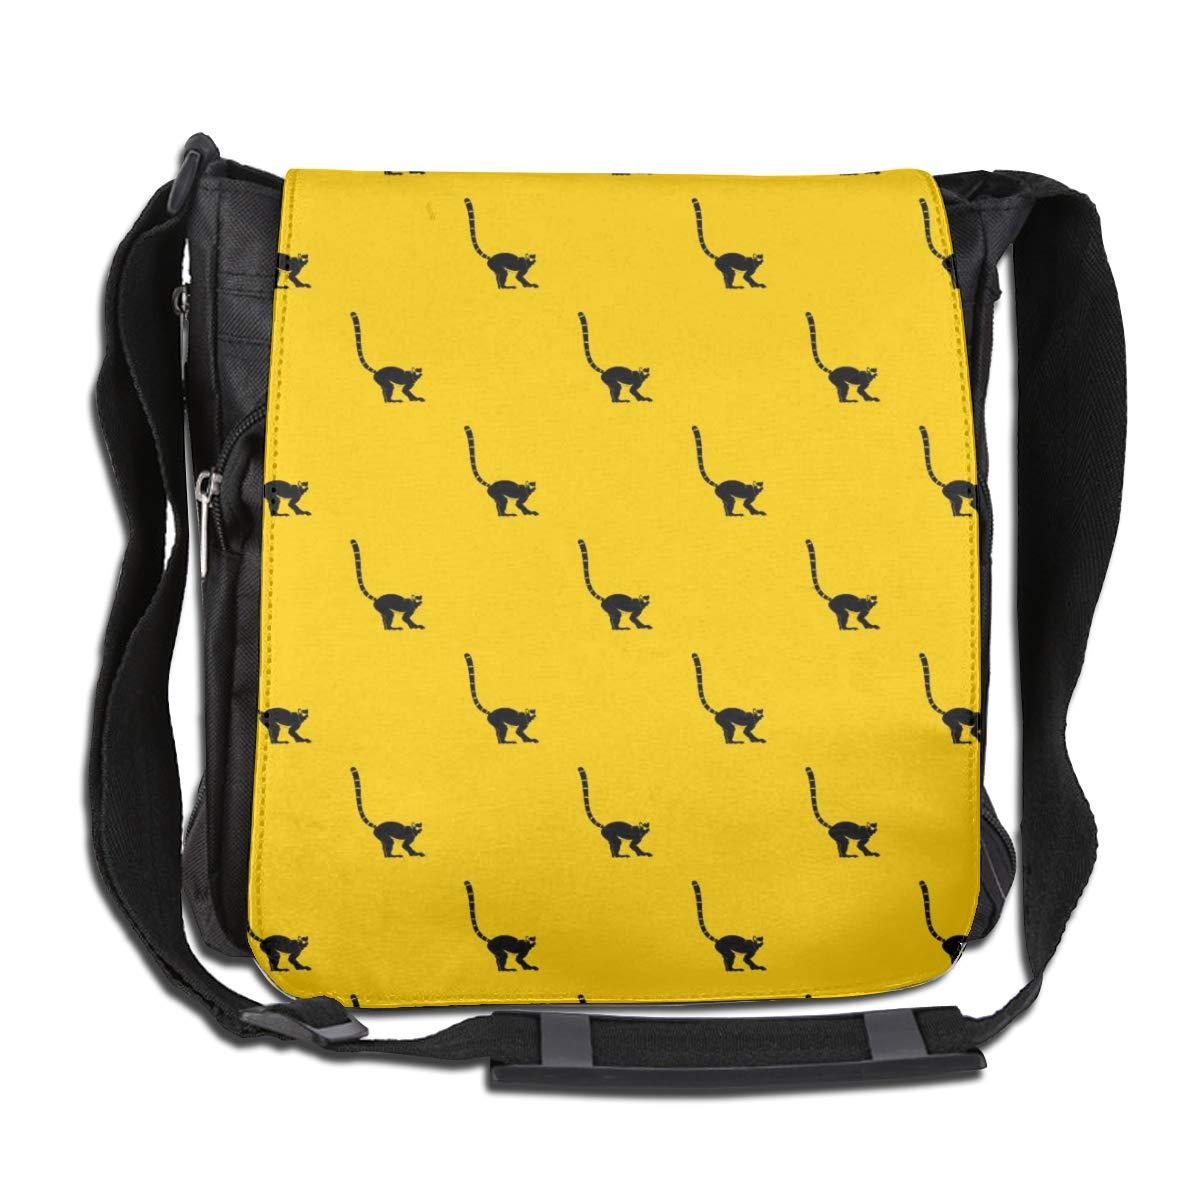 Lemur Monkey Men Women Inspirational Satchel Messenger Bags Crossbody Sling Working Bag Travel Shoulder Bags Office//School